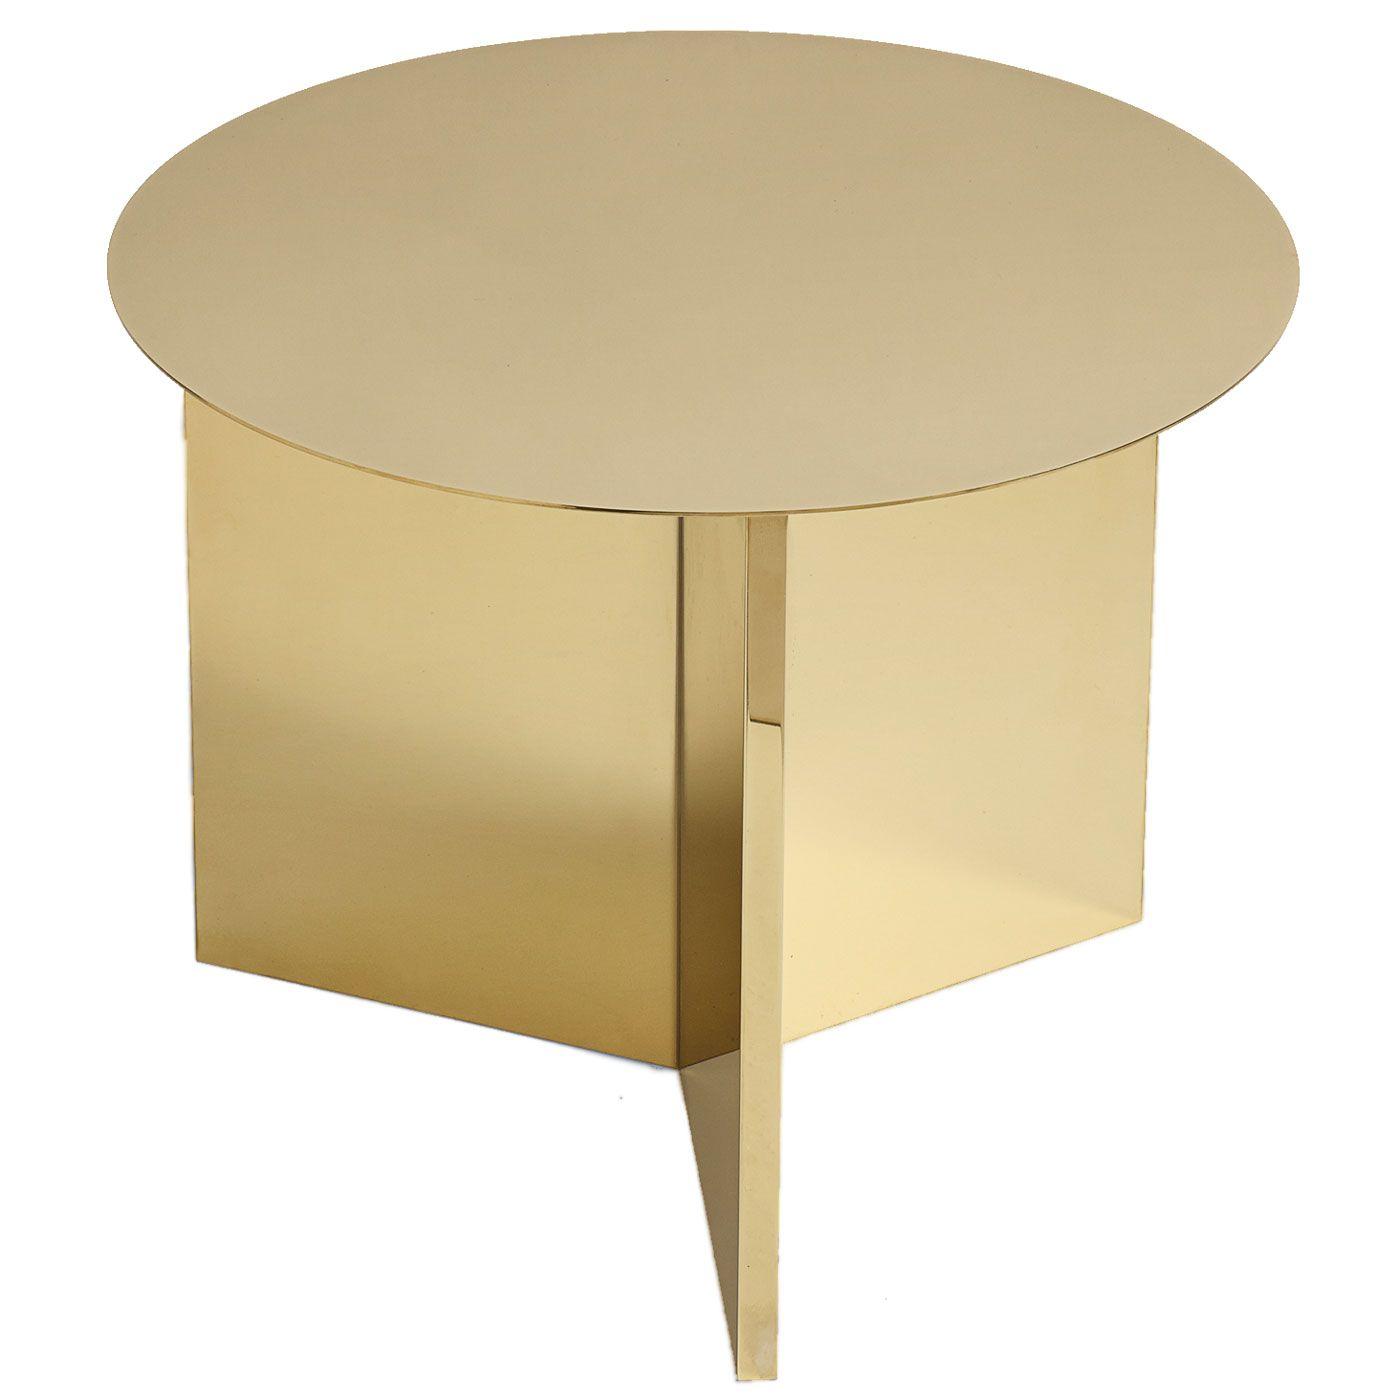 Hay Slit Table Round bijzettafel messing